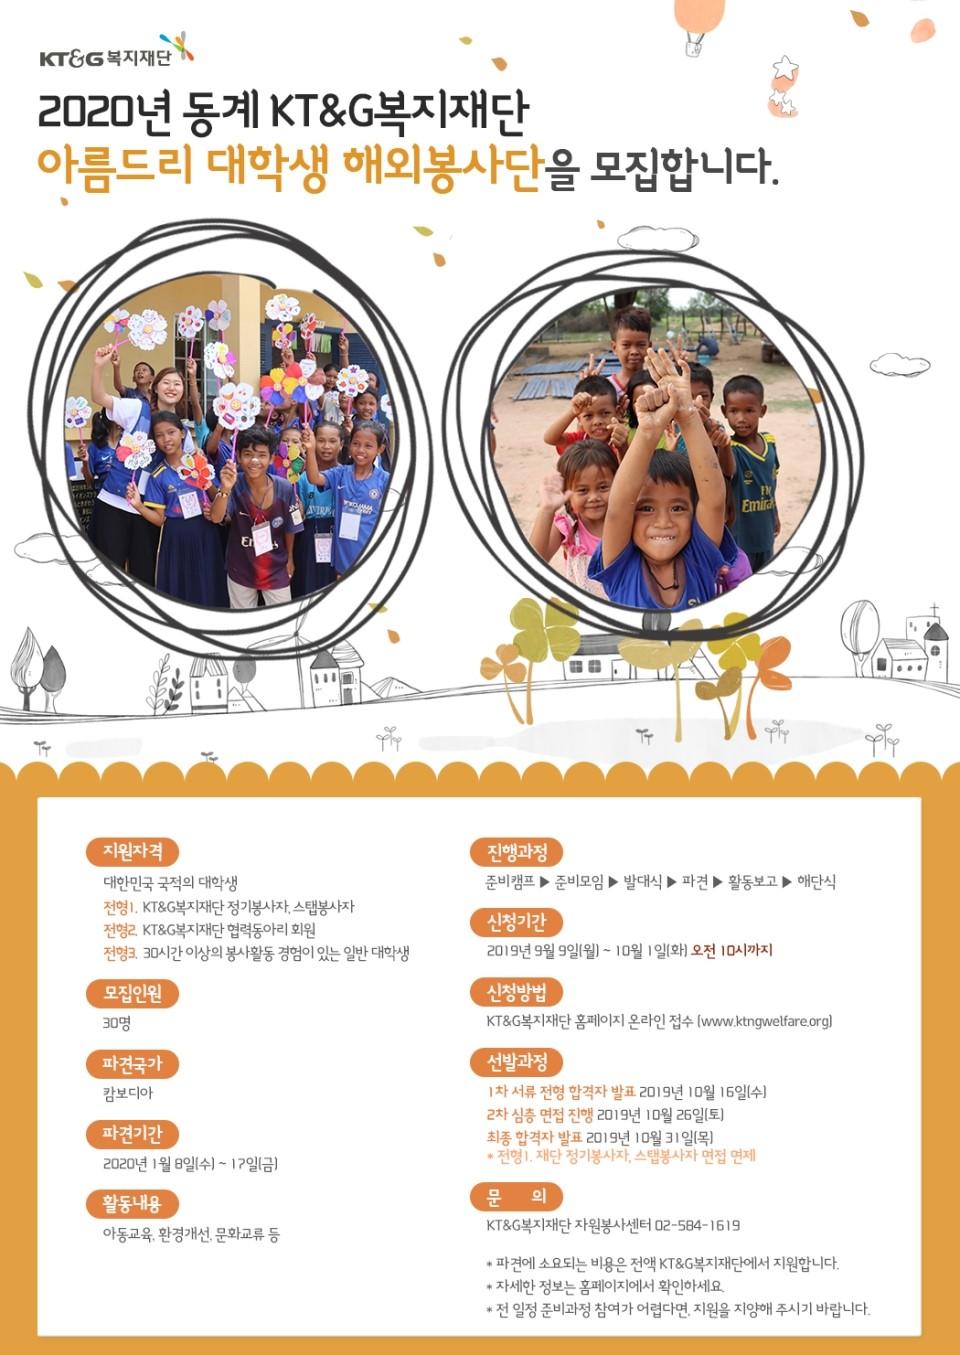 [KT&G복지재단]2020년 동계 아름드리 대학생 해외봉사단 모집 (~10/1)